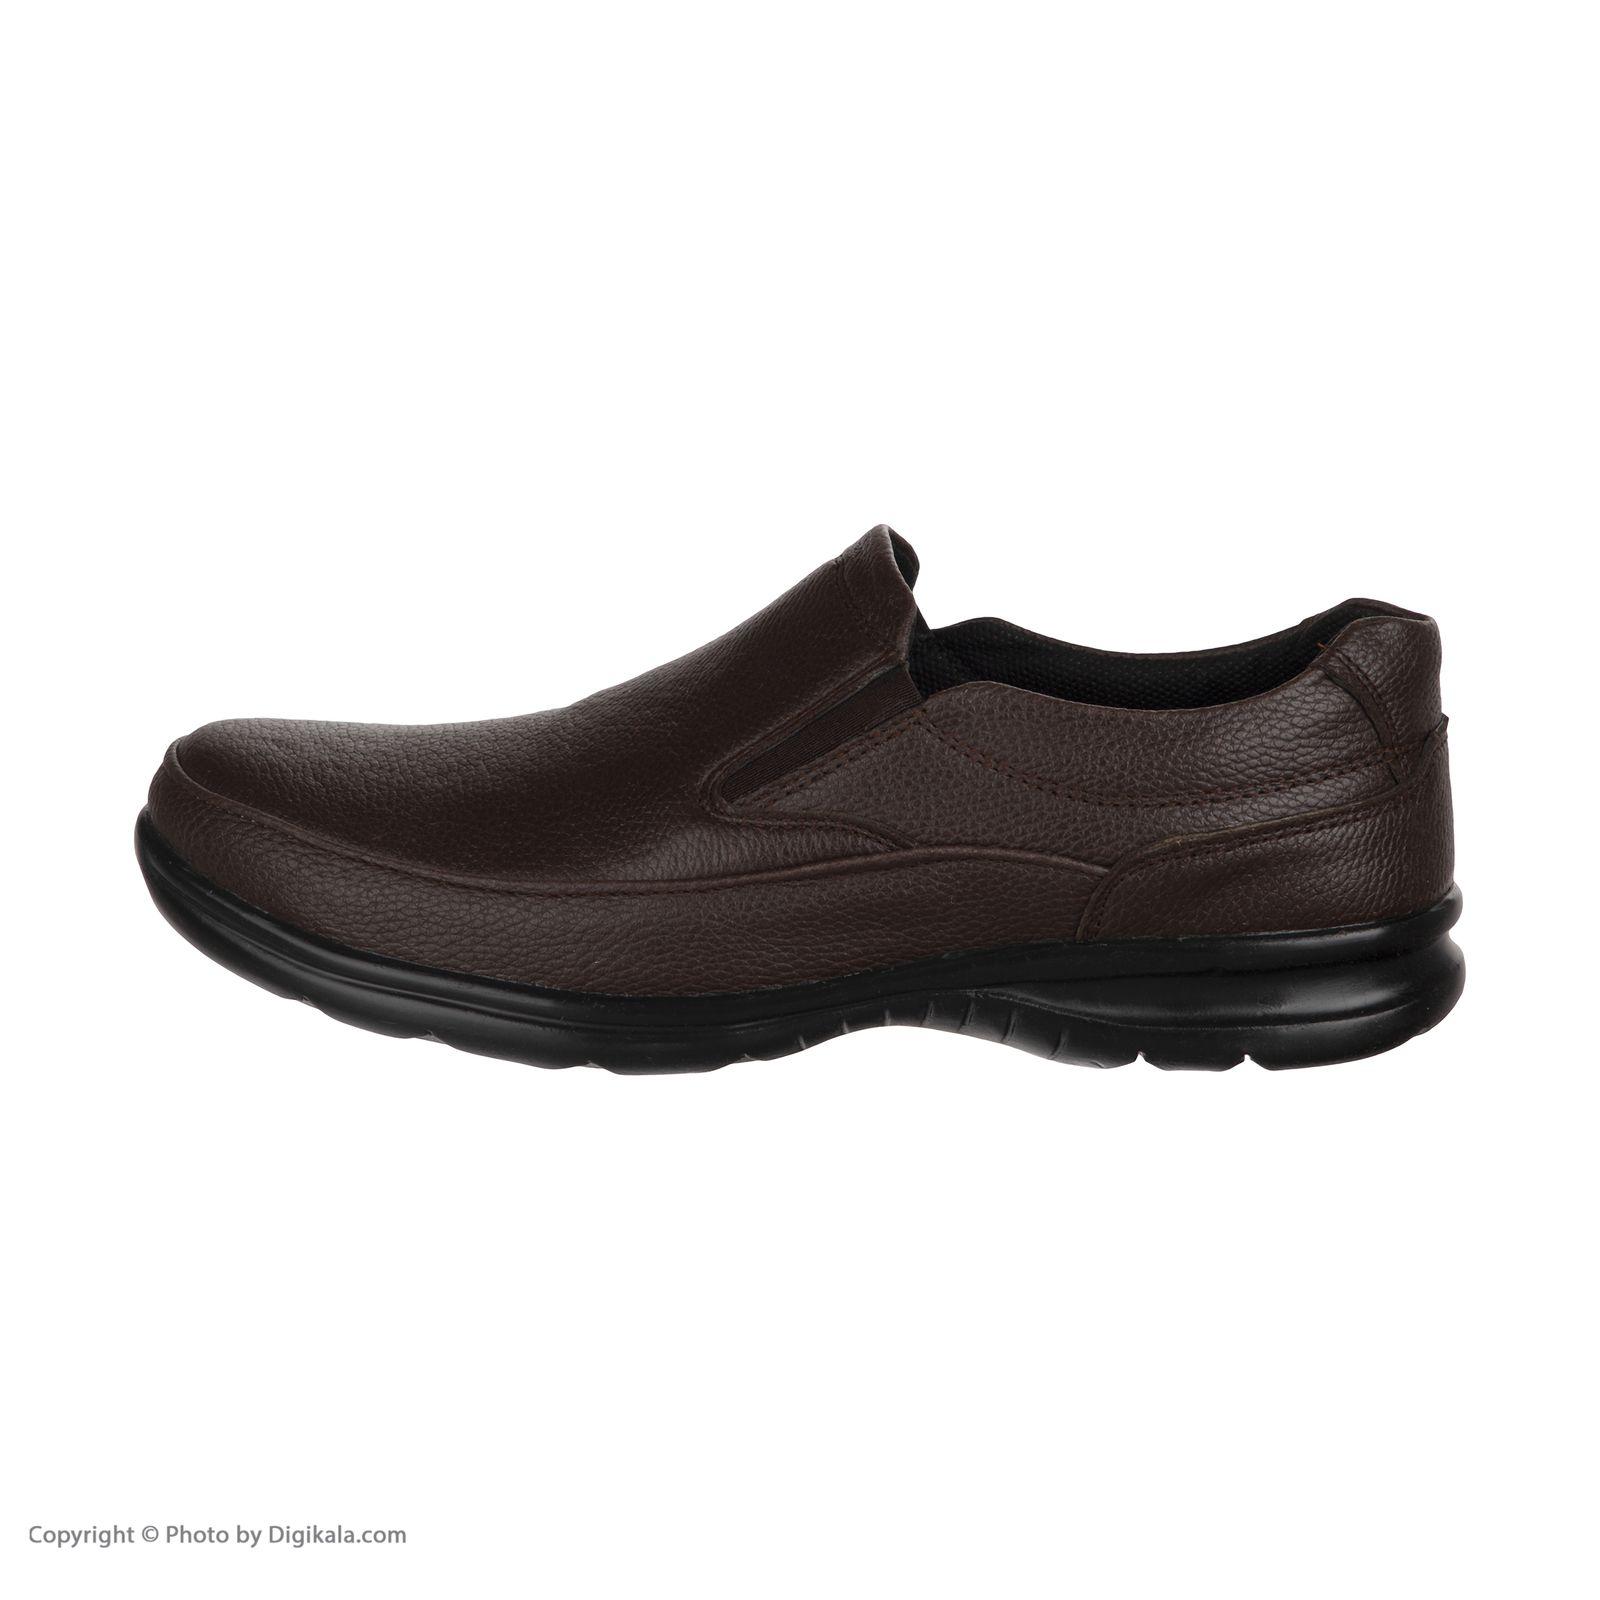 کفش روزمره مردانه مدل k.baz.073 -  - 3